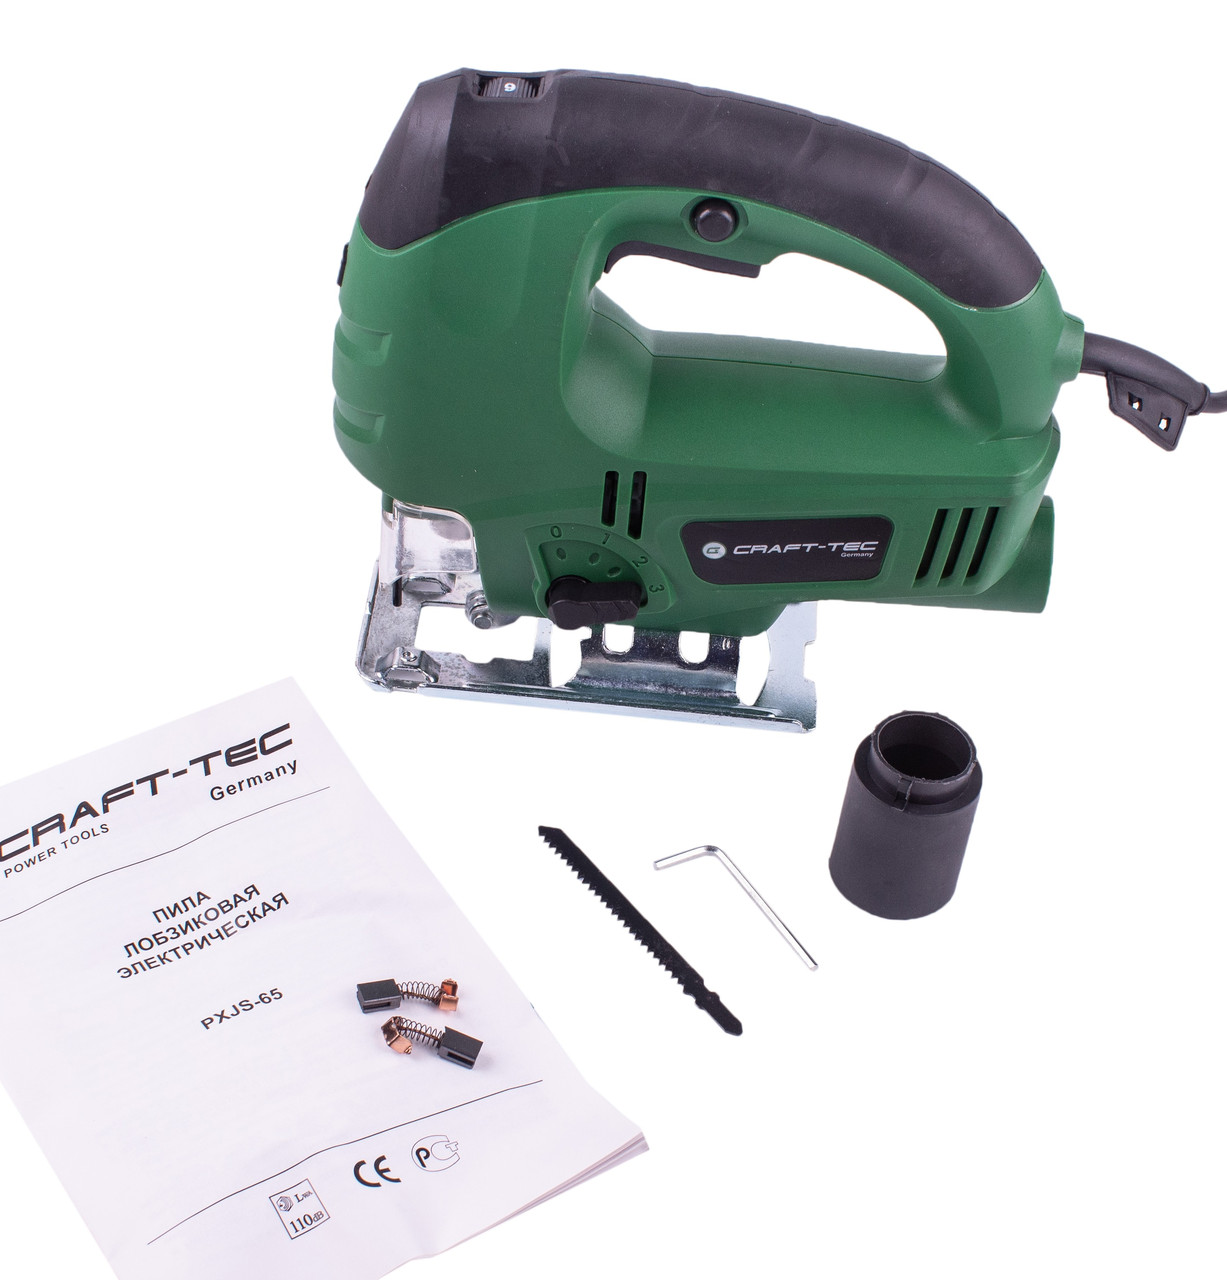 Лобзик электрический Craft-tec PXGS-65 (900Вт, Лазер)